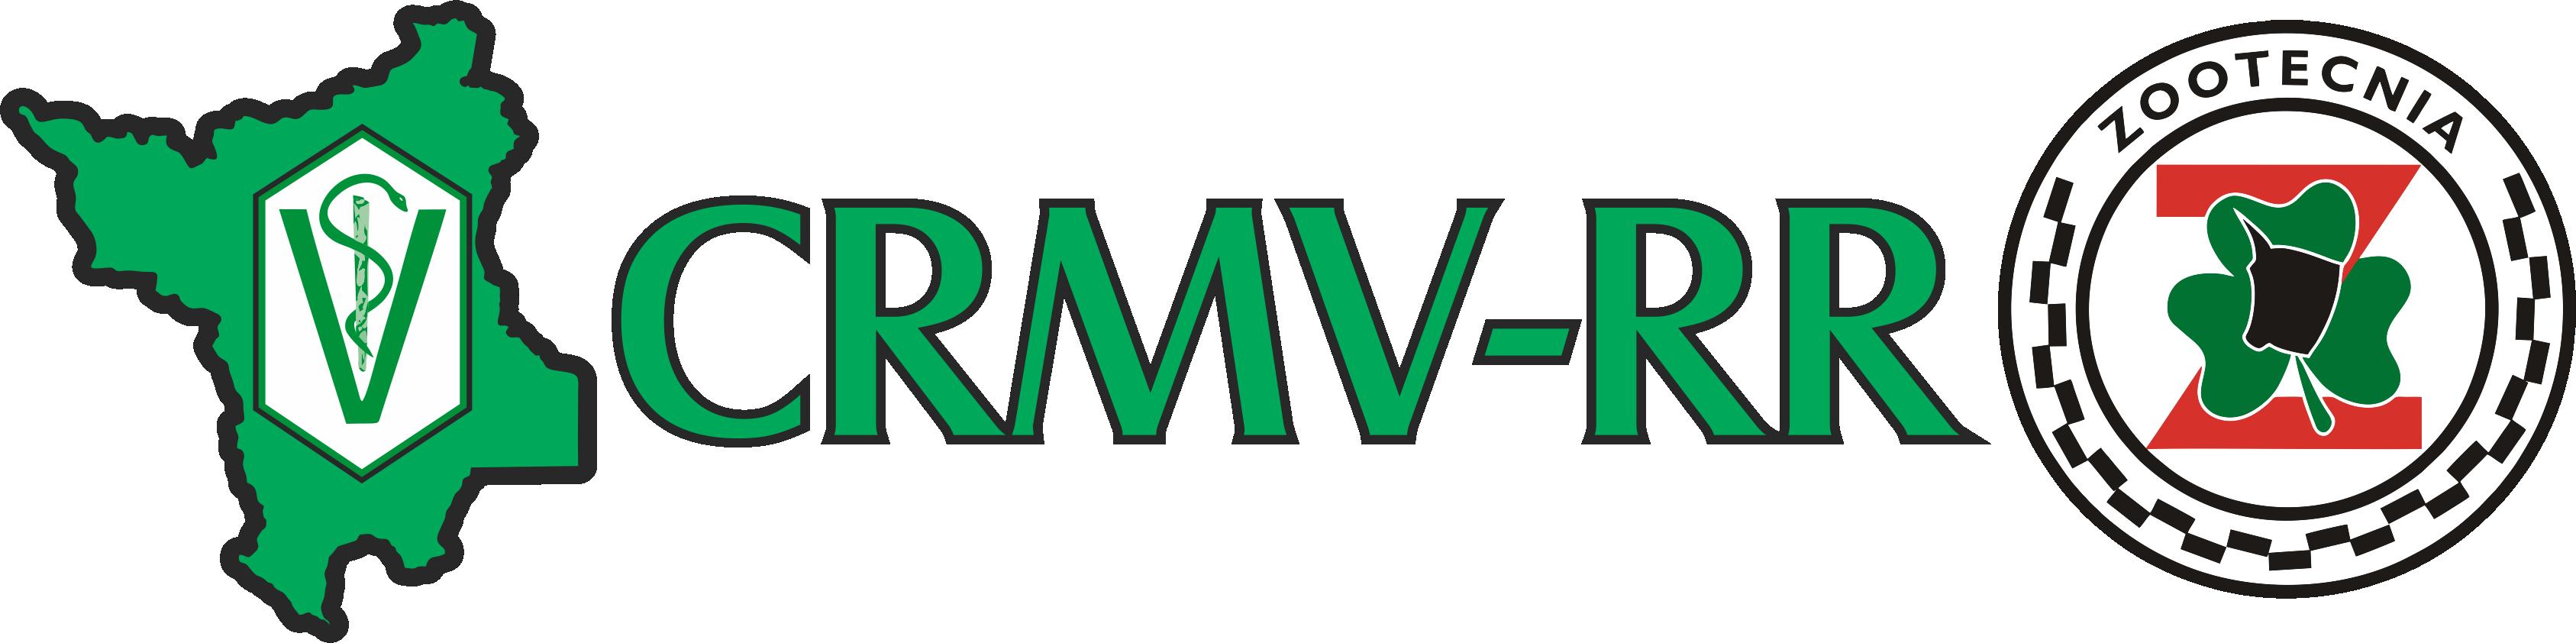 CRMV-RR